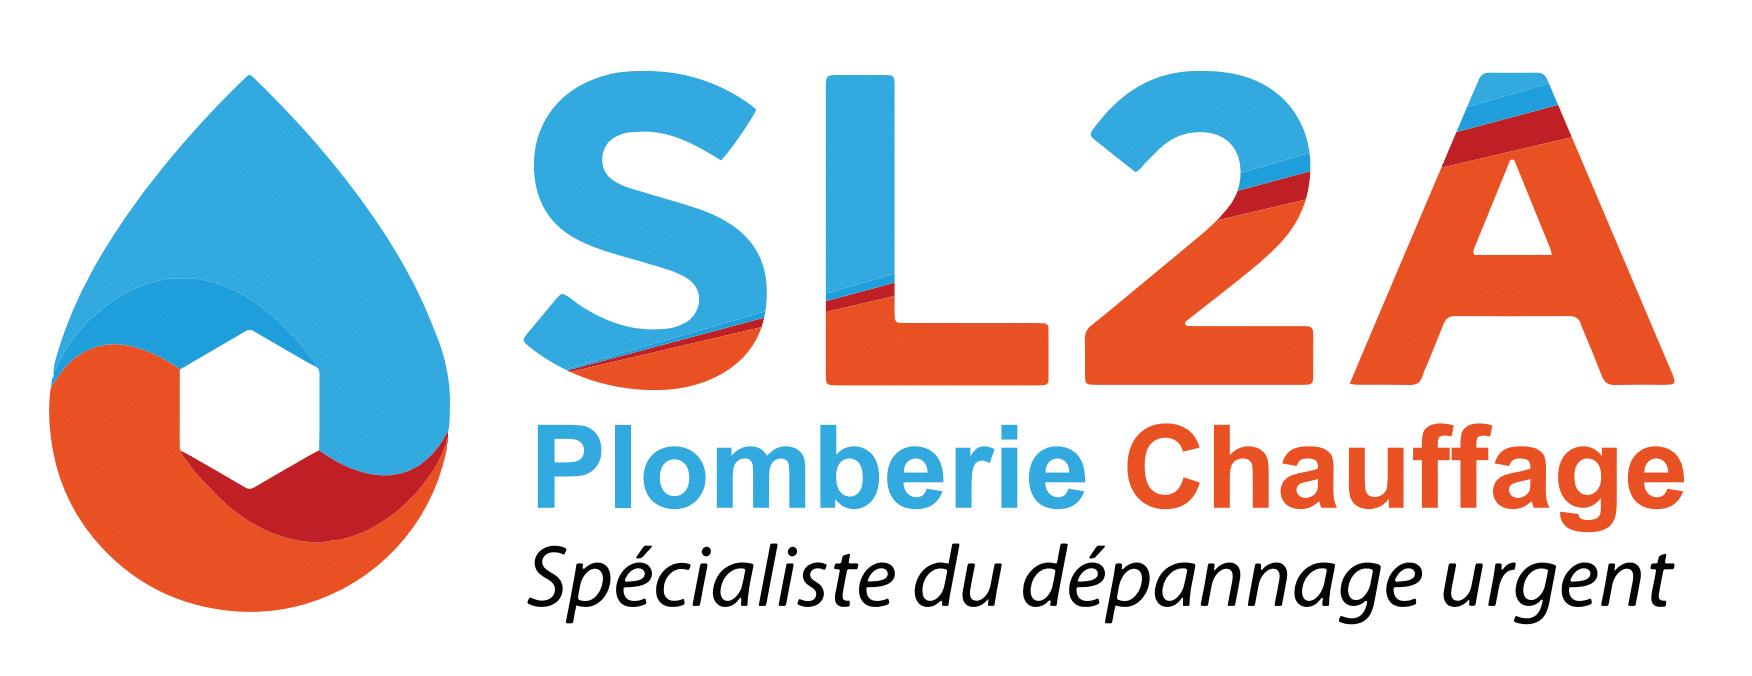 SL2A Plomberie et Chauffage